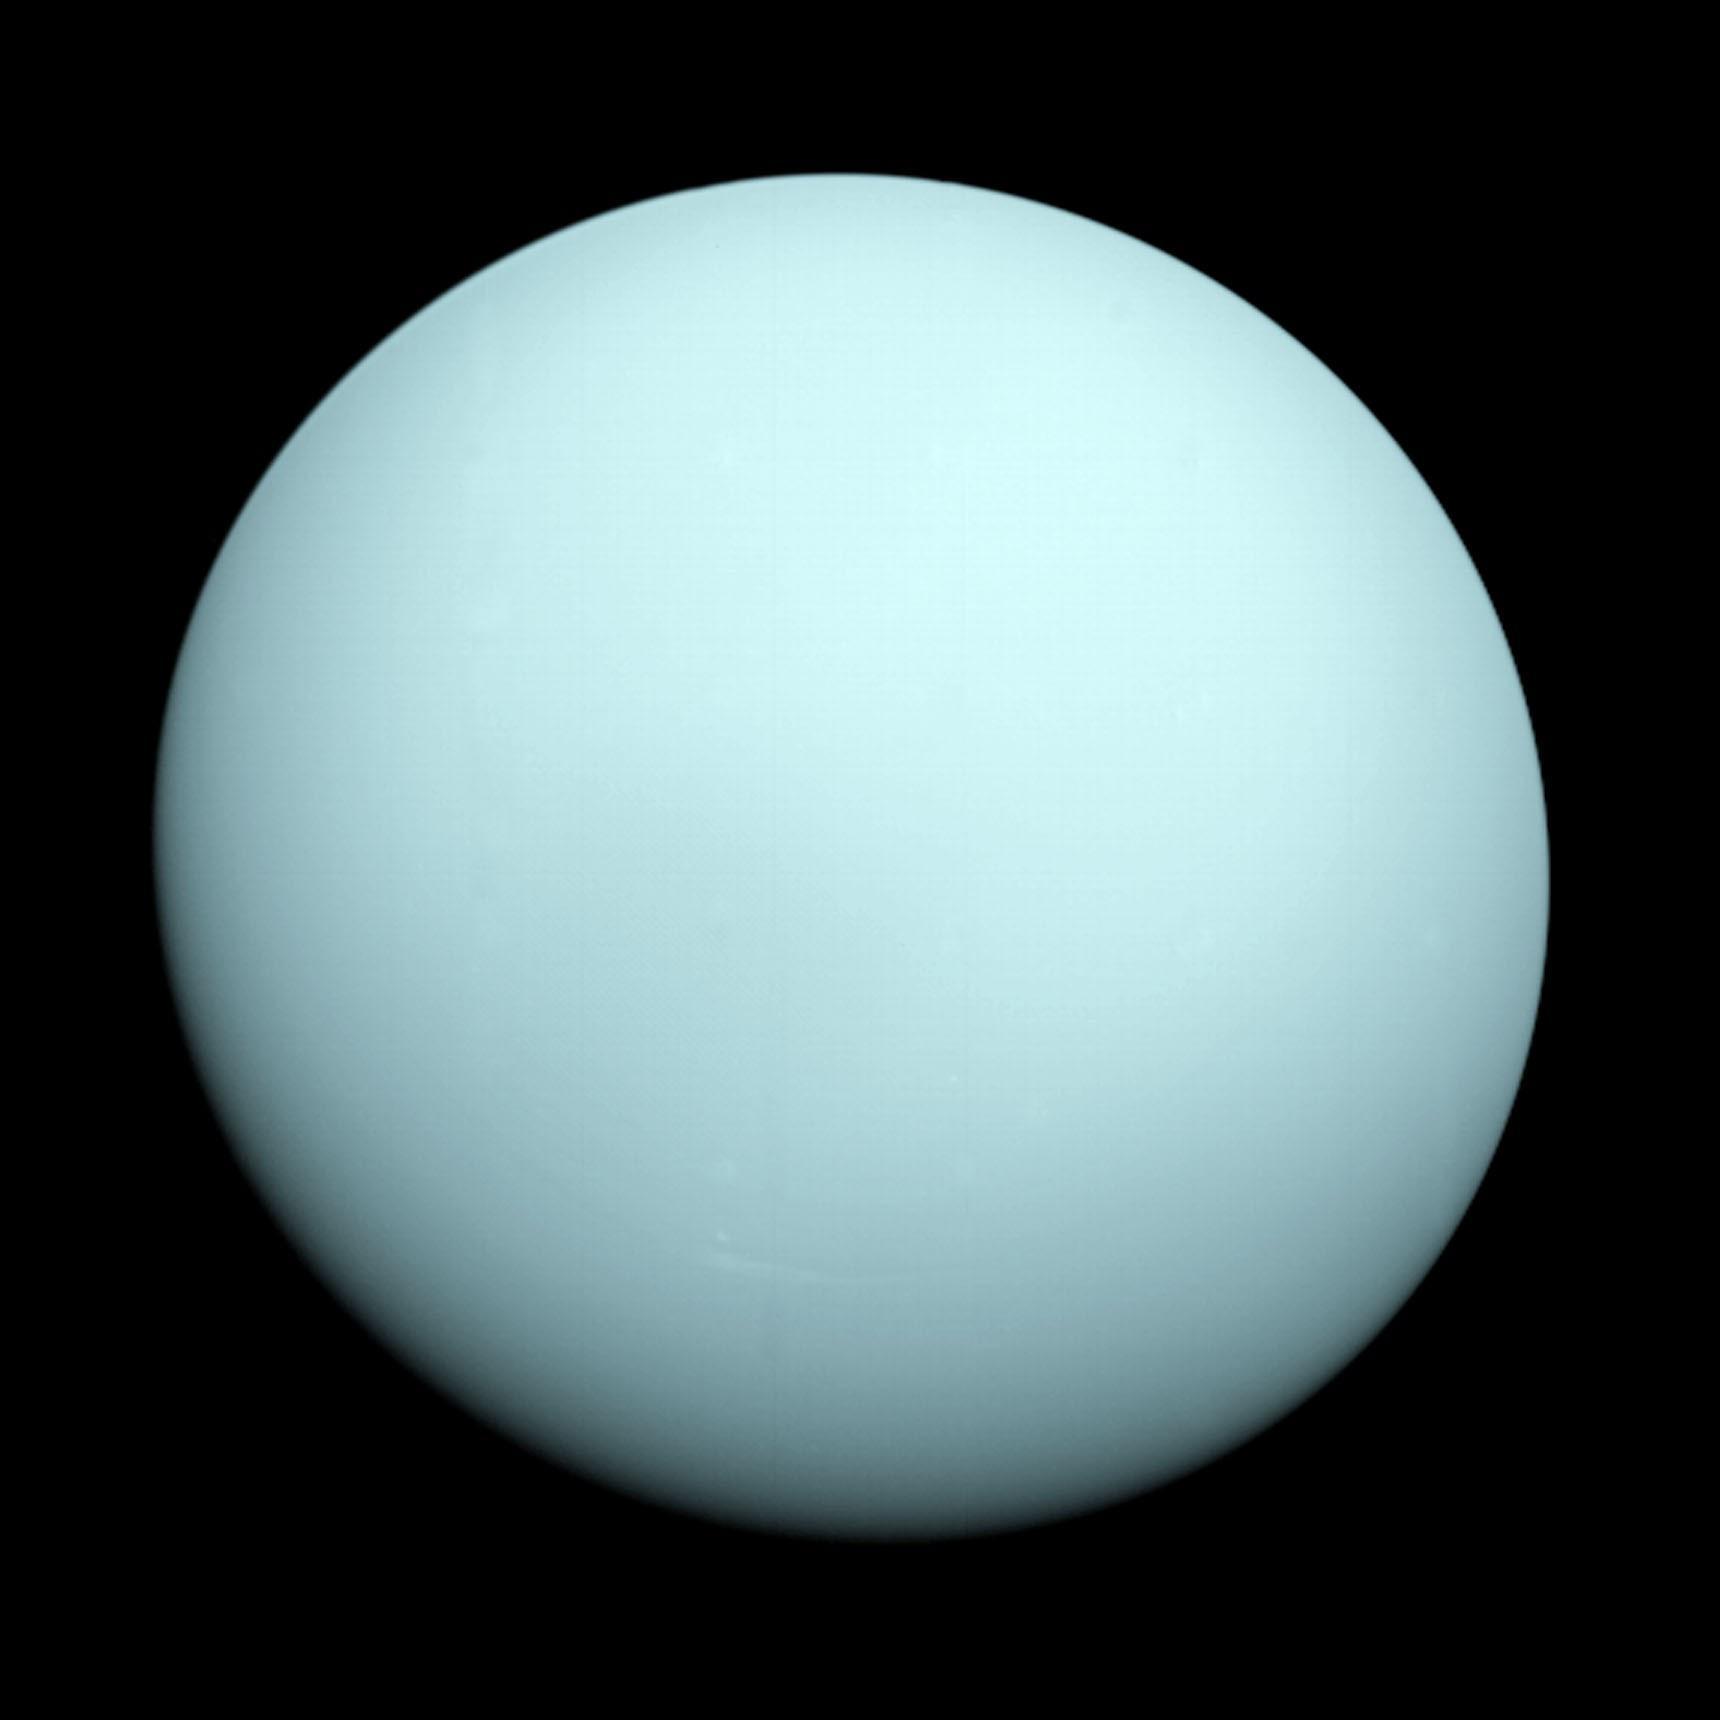 Uranus. Credit: NASA/JPL-Caltech.